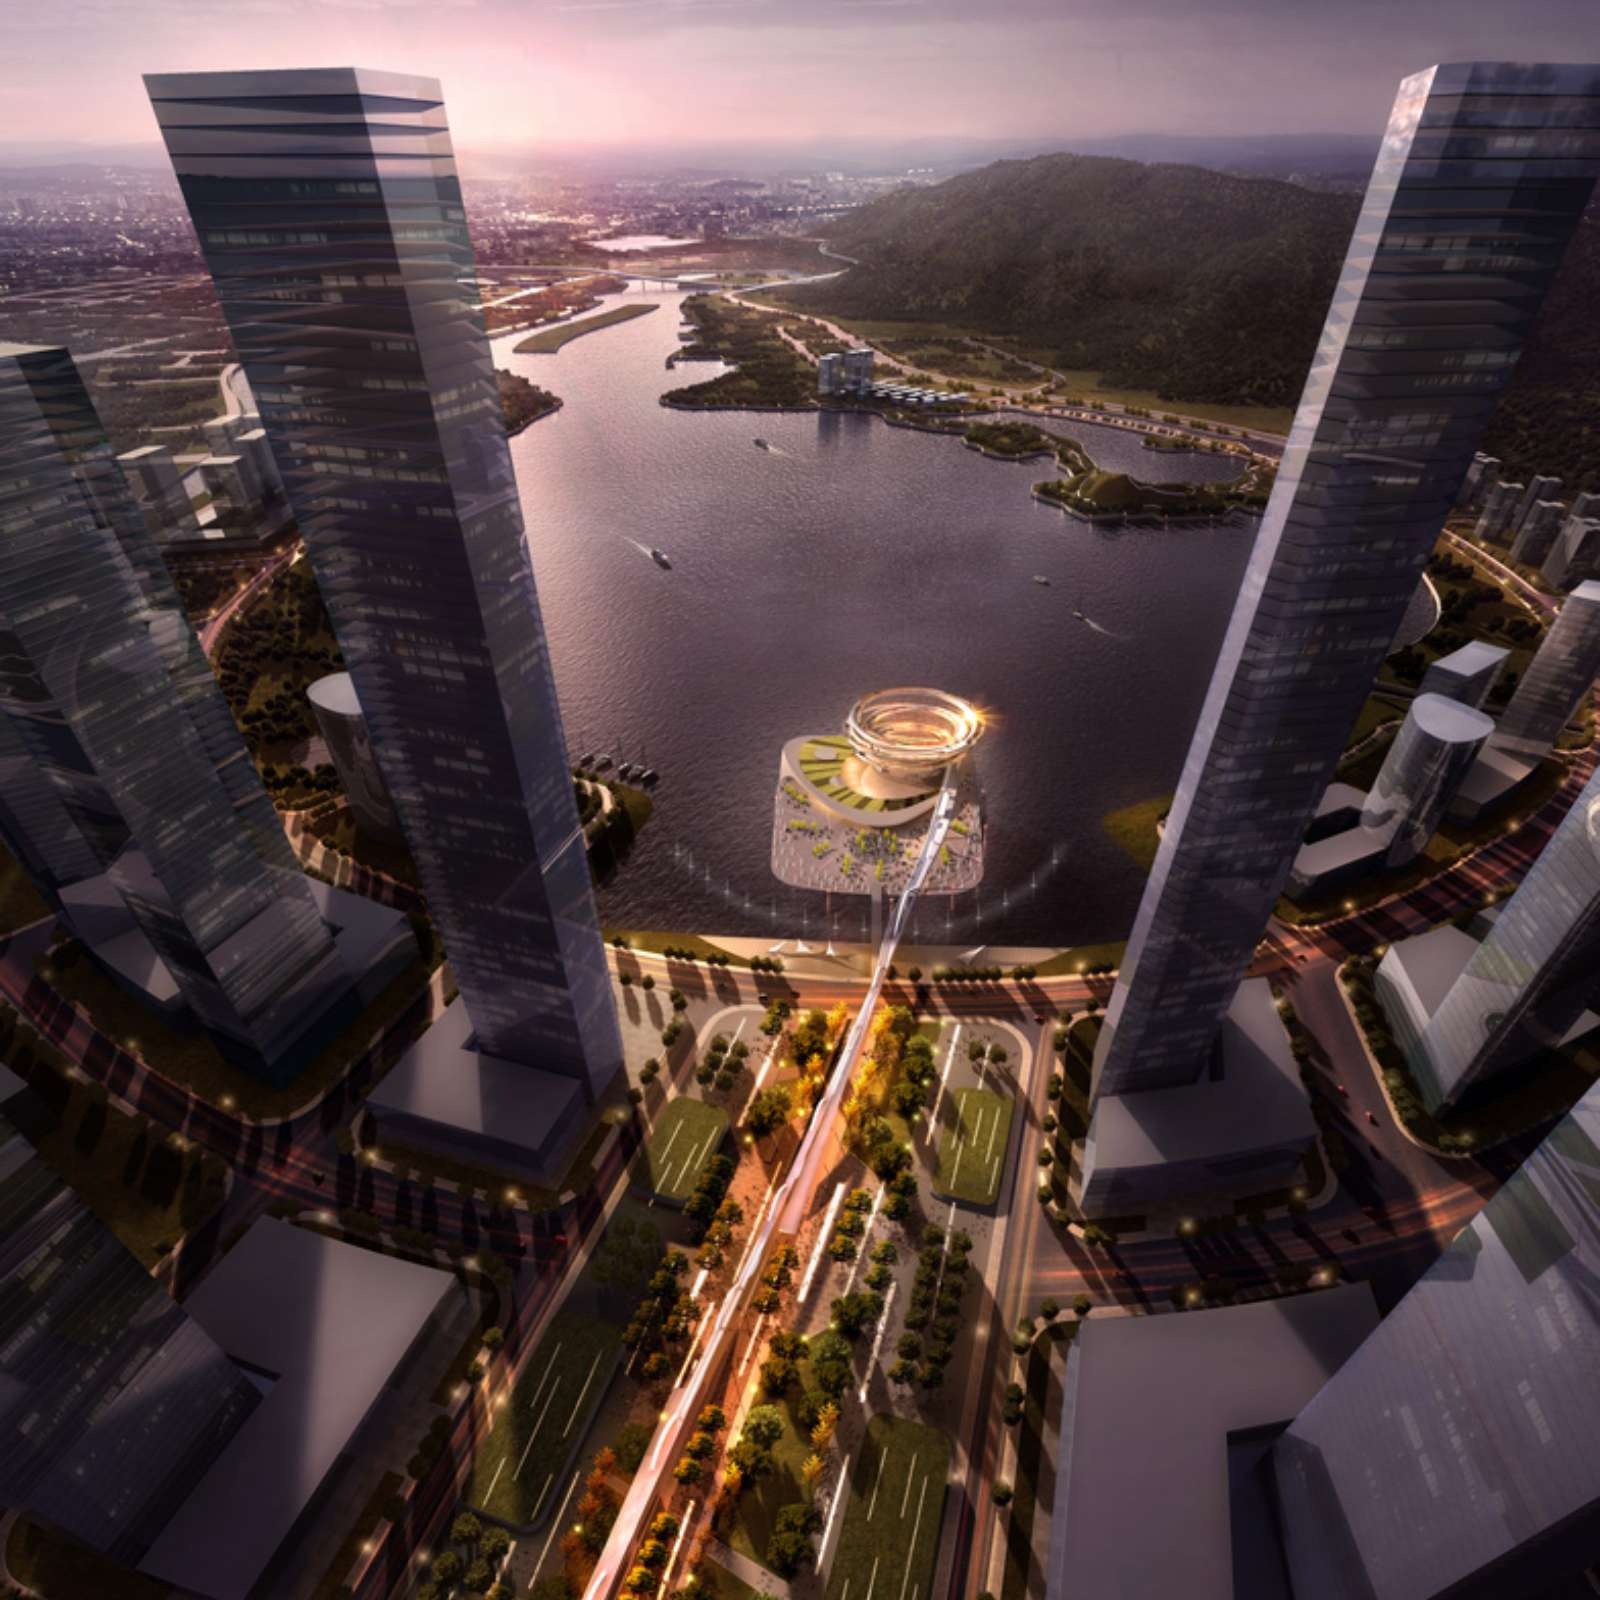 02-KSP-wins-the-Meixi-Urban-Helix-competition